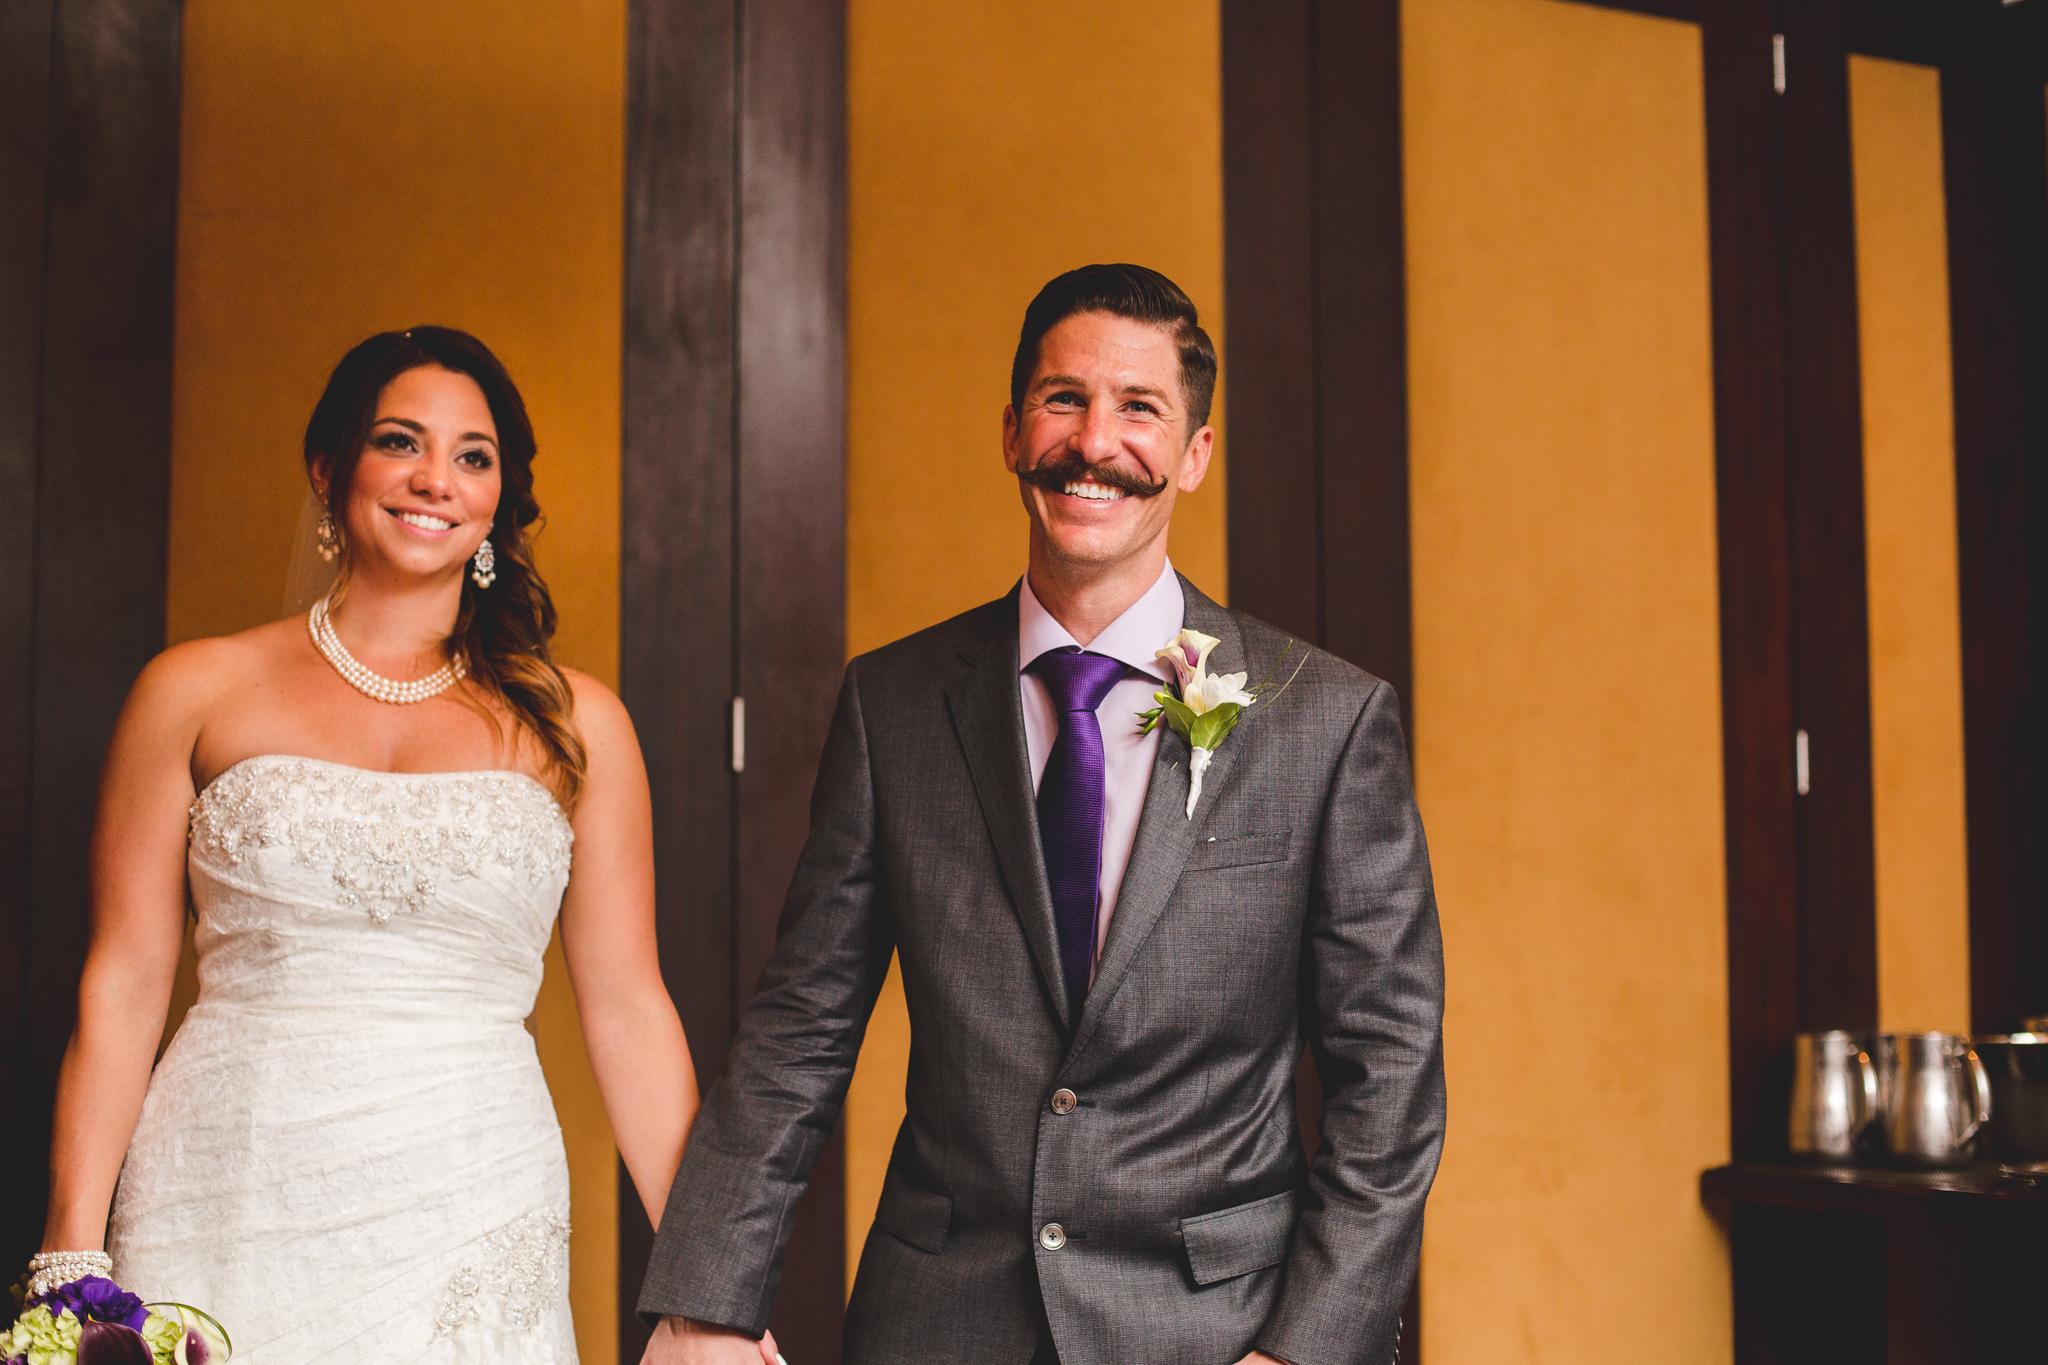 lc bride and groom enter reception